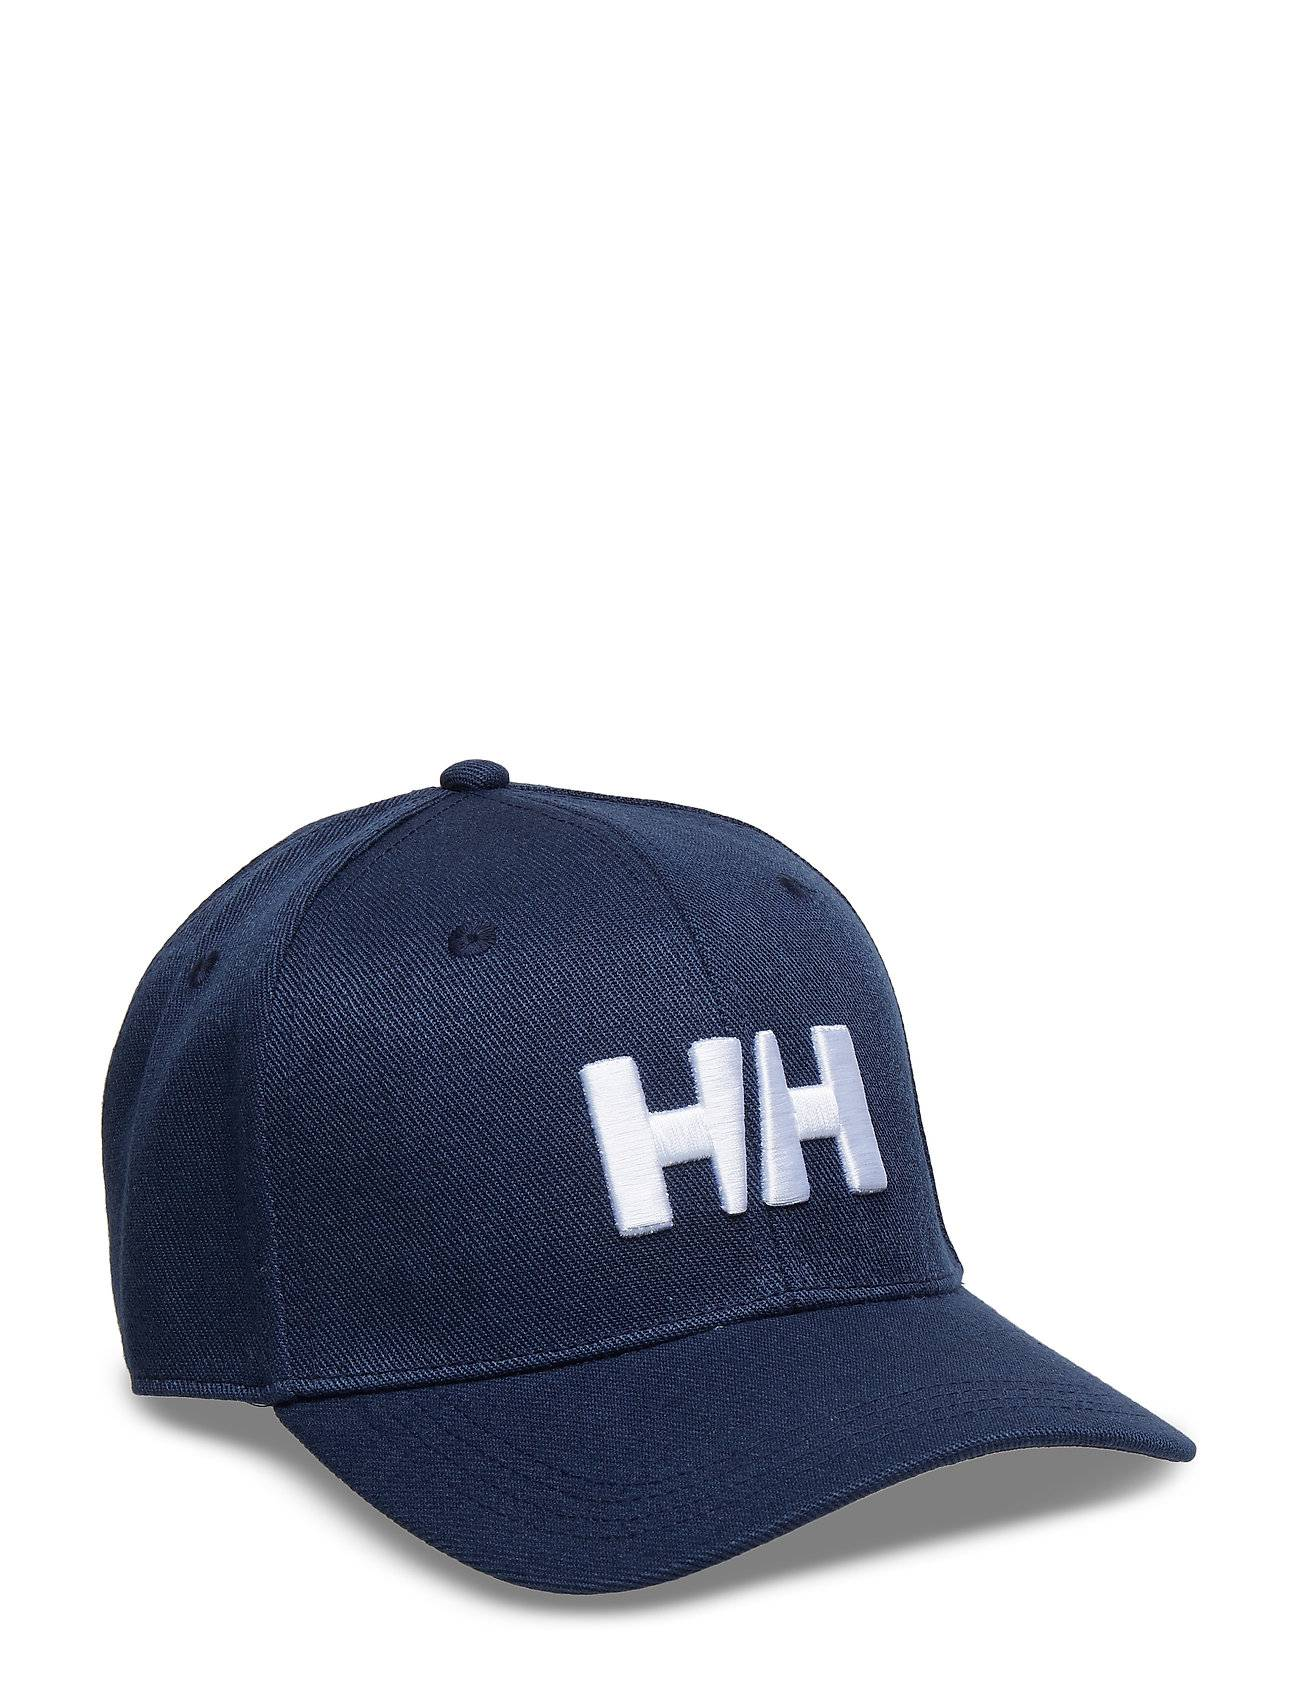 HELLY HANSEN Hh Brand Cap Lippalakki Sininen HELLY HANSEN